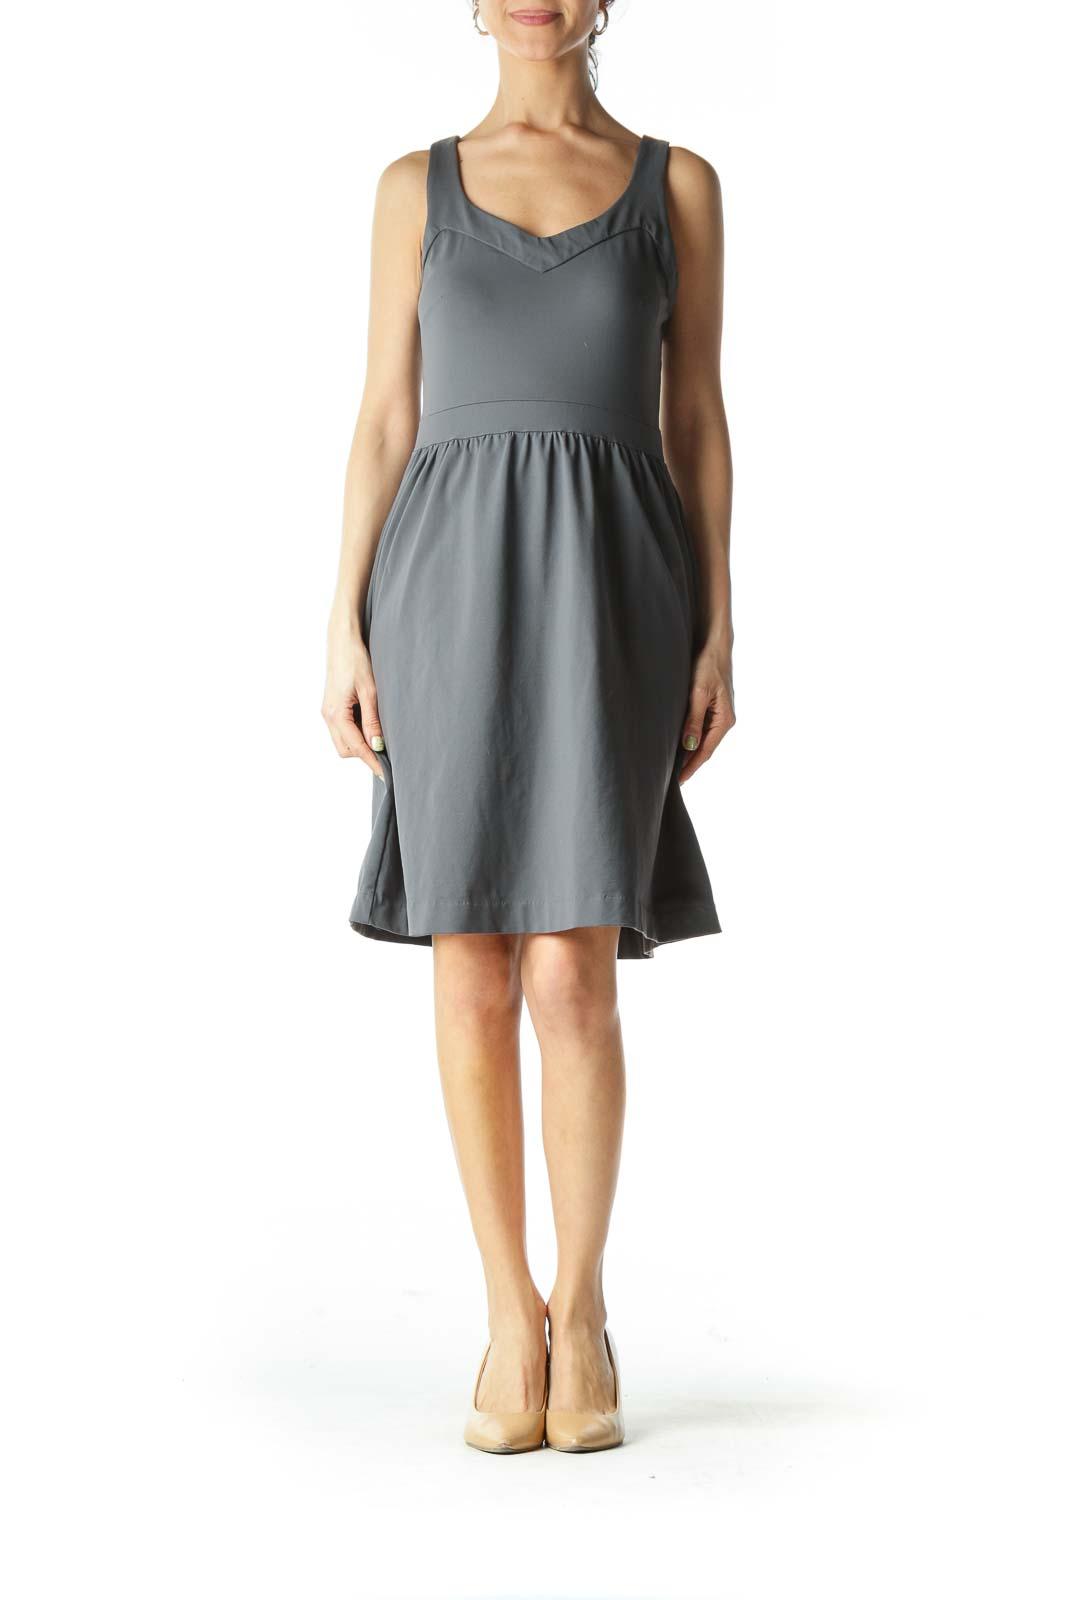 Gray Banded-Neckline Sheath-Waist Day Dress